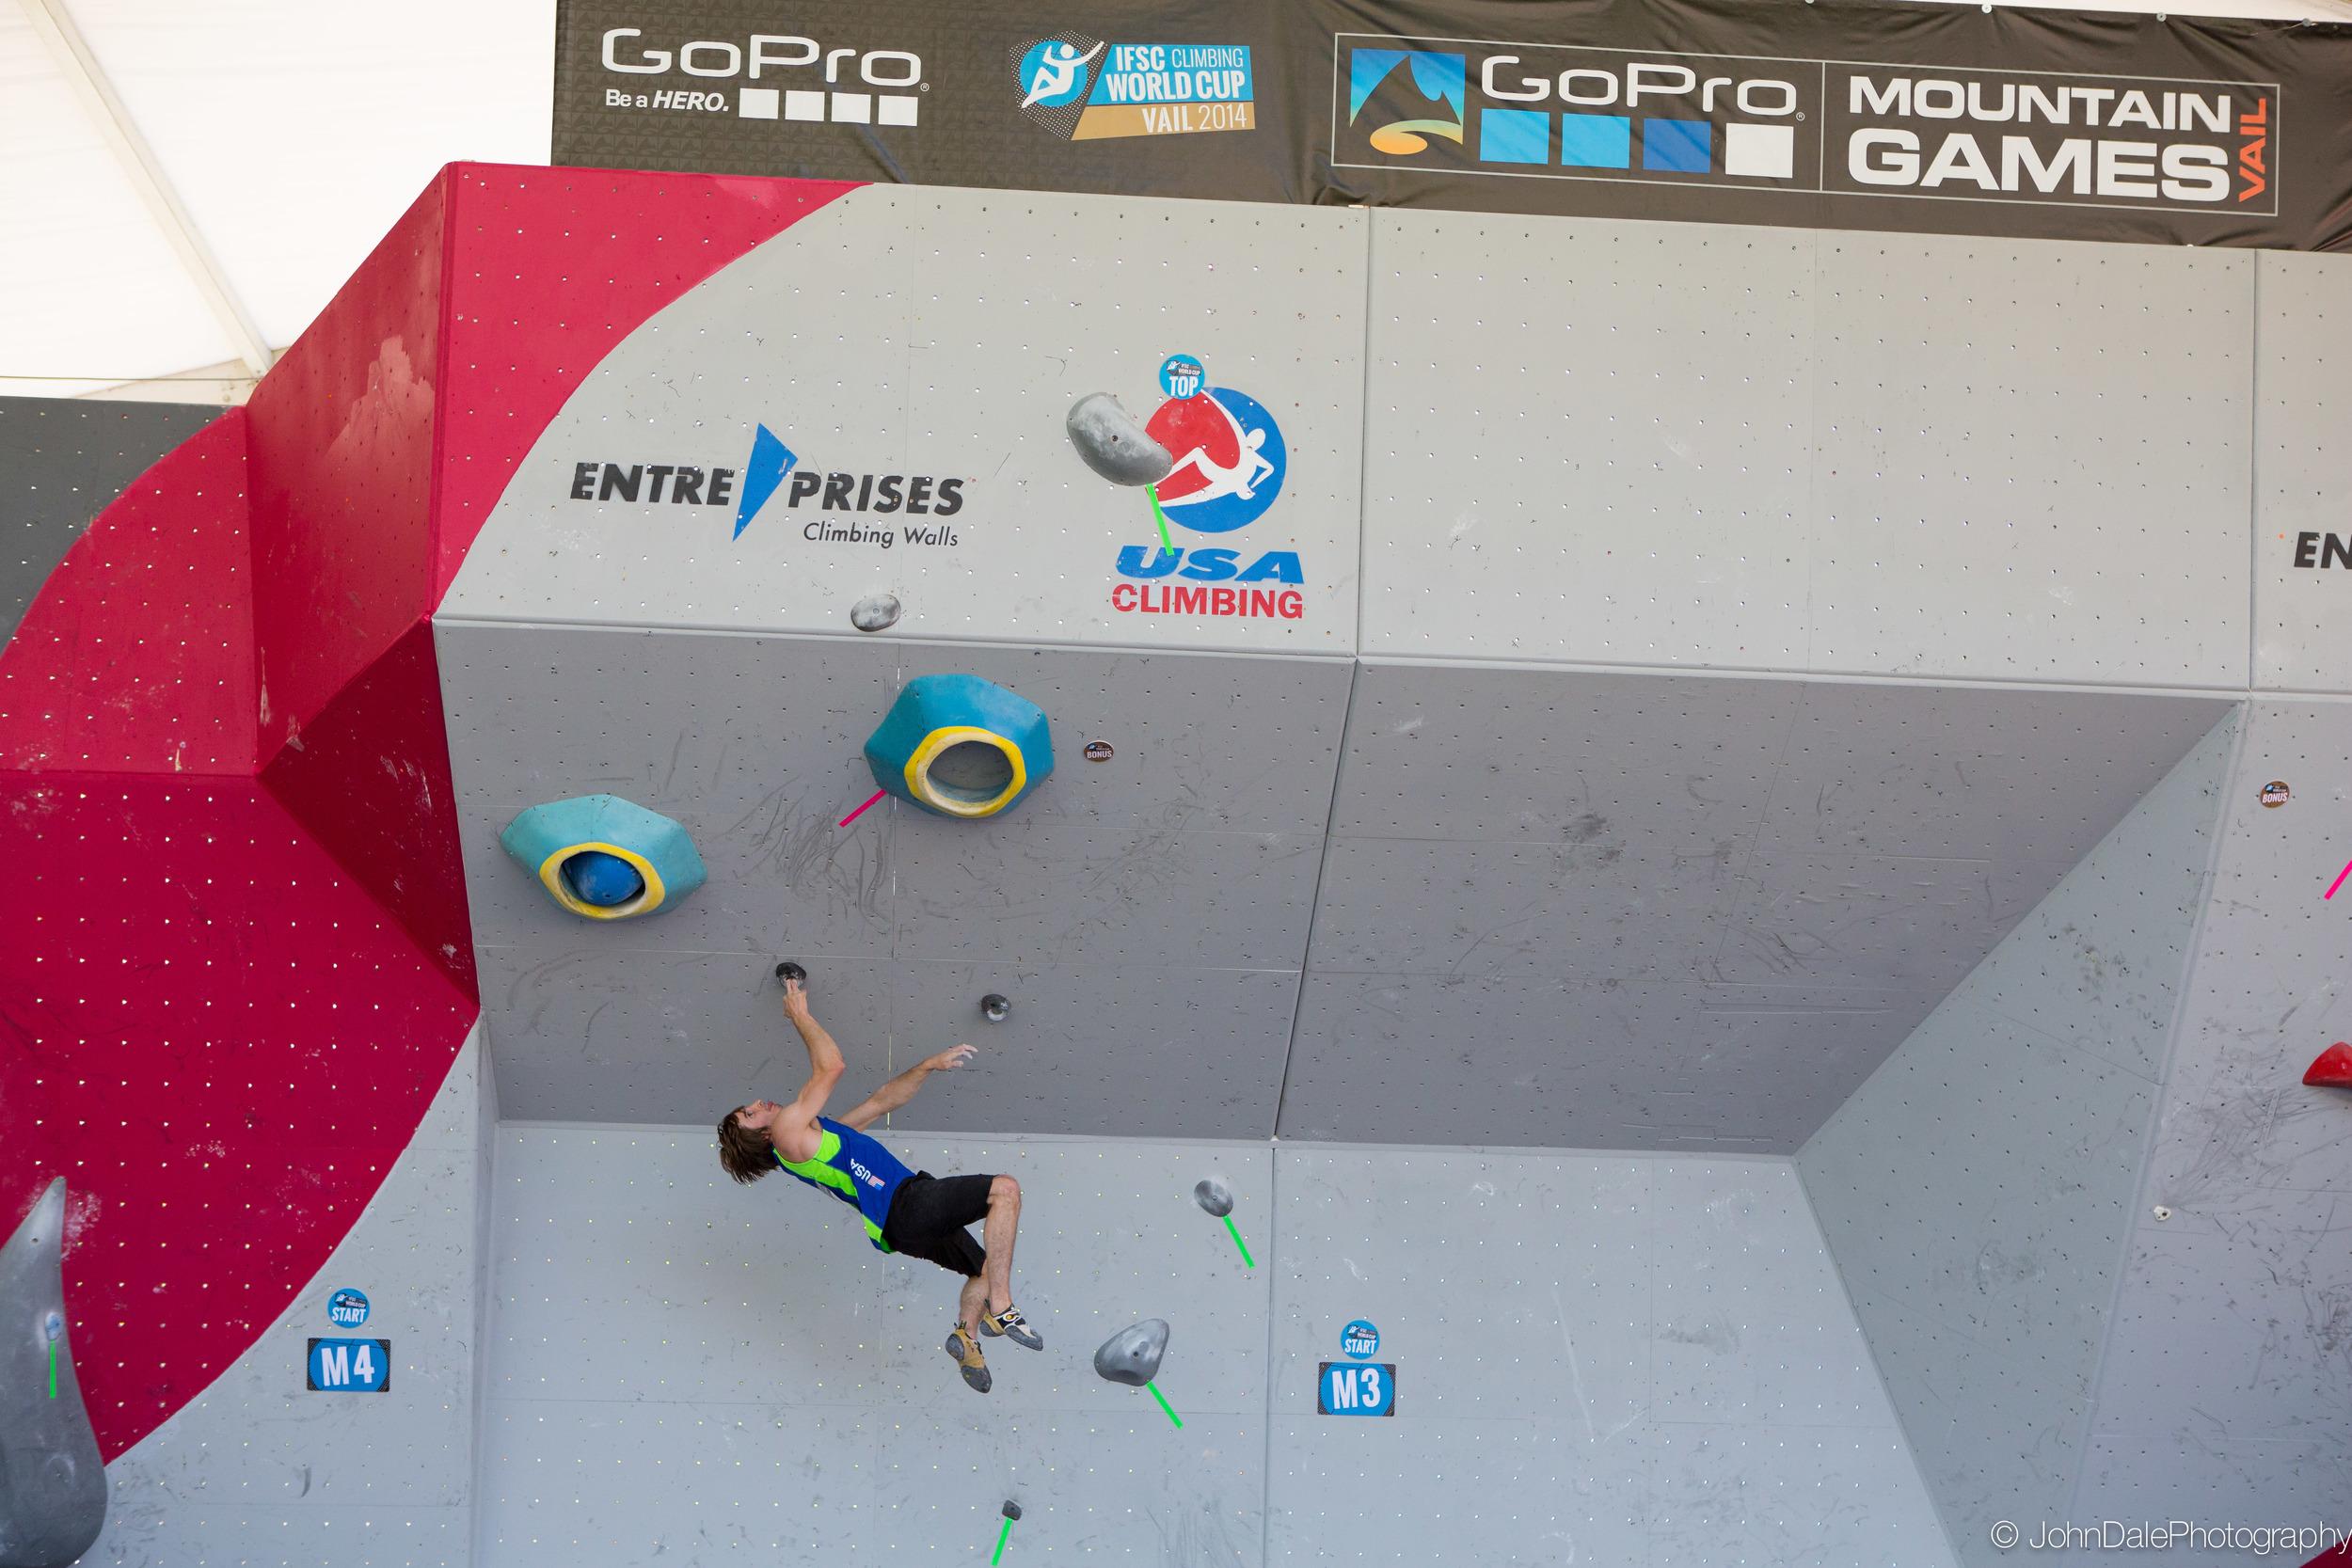 Climbing at the 2014 GoPro Mountain Games-6.jpg